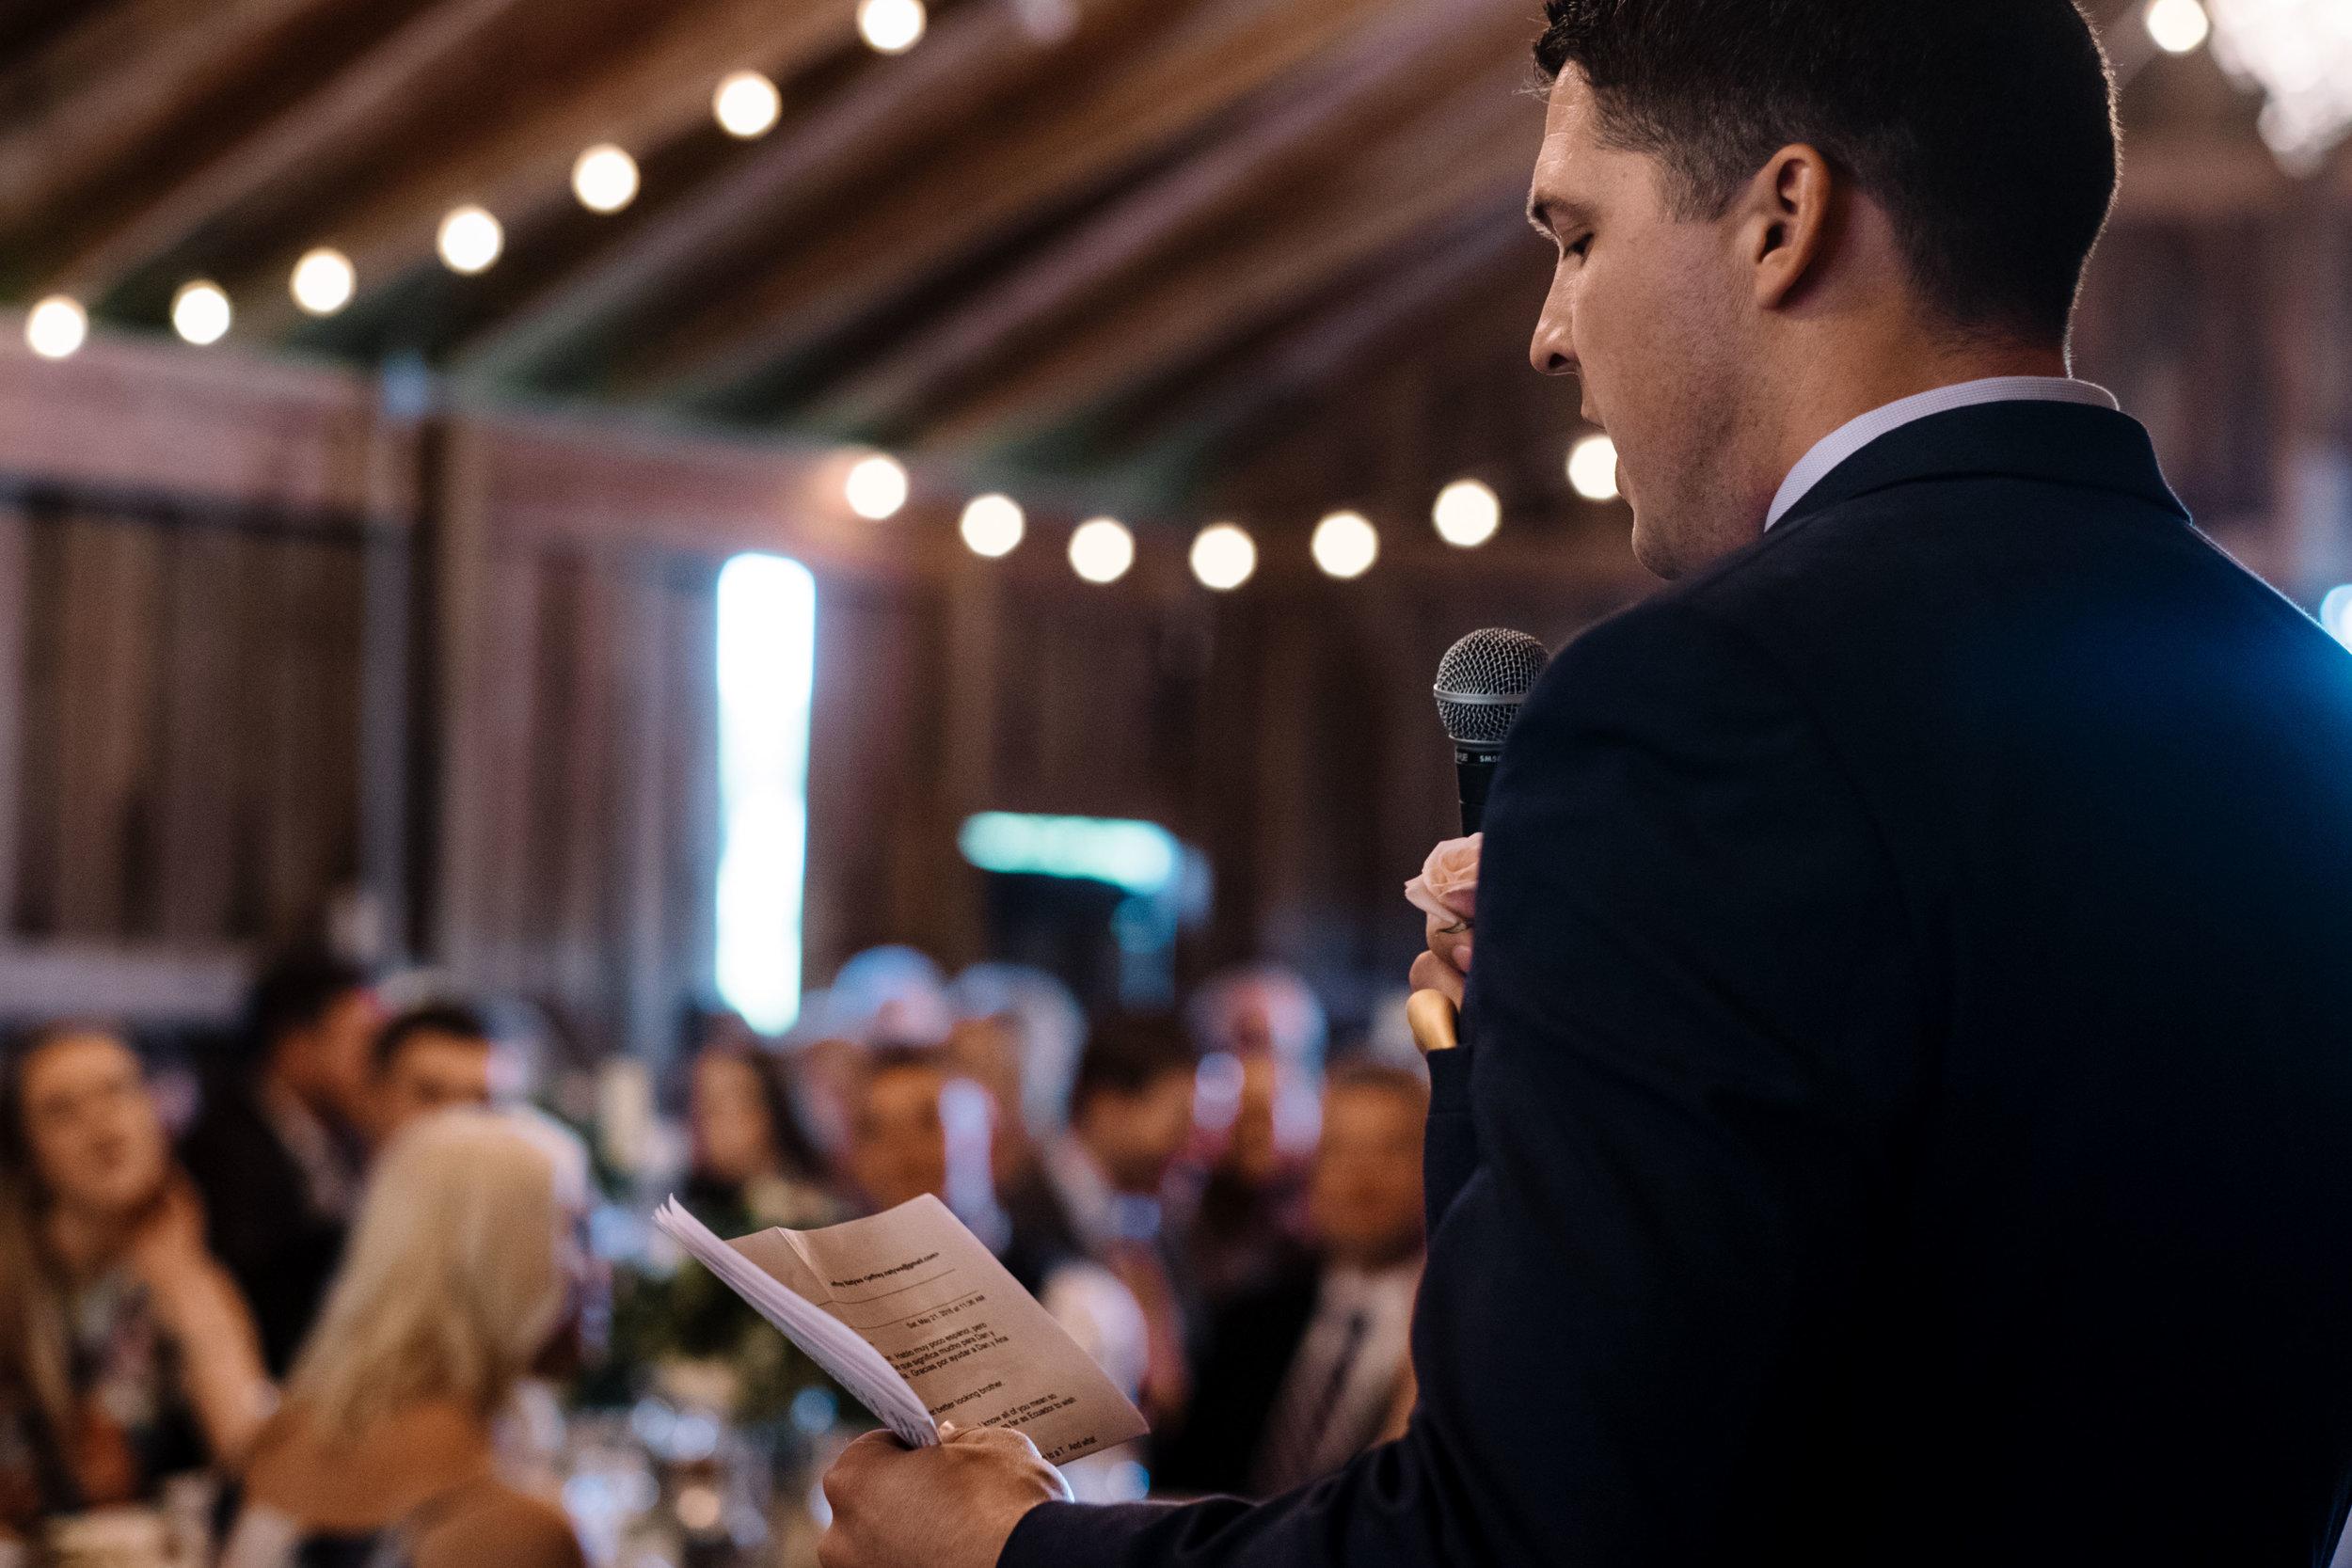 Ana-Dan-Blog-Indianapolis-Wedding-116.jpg